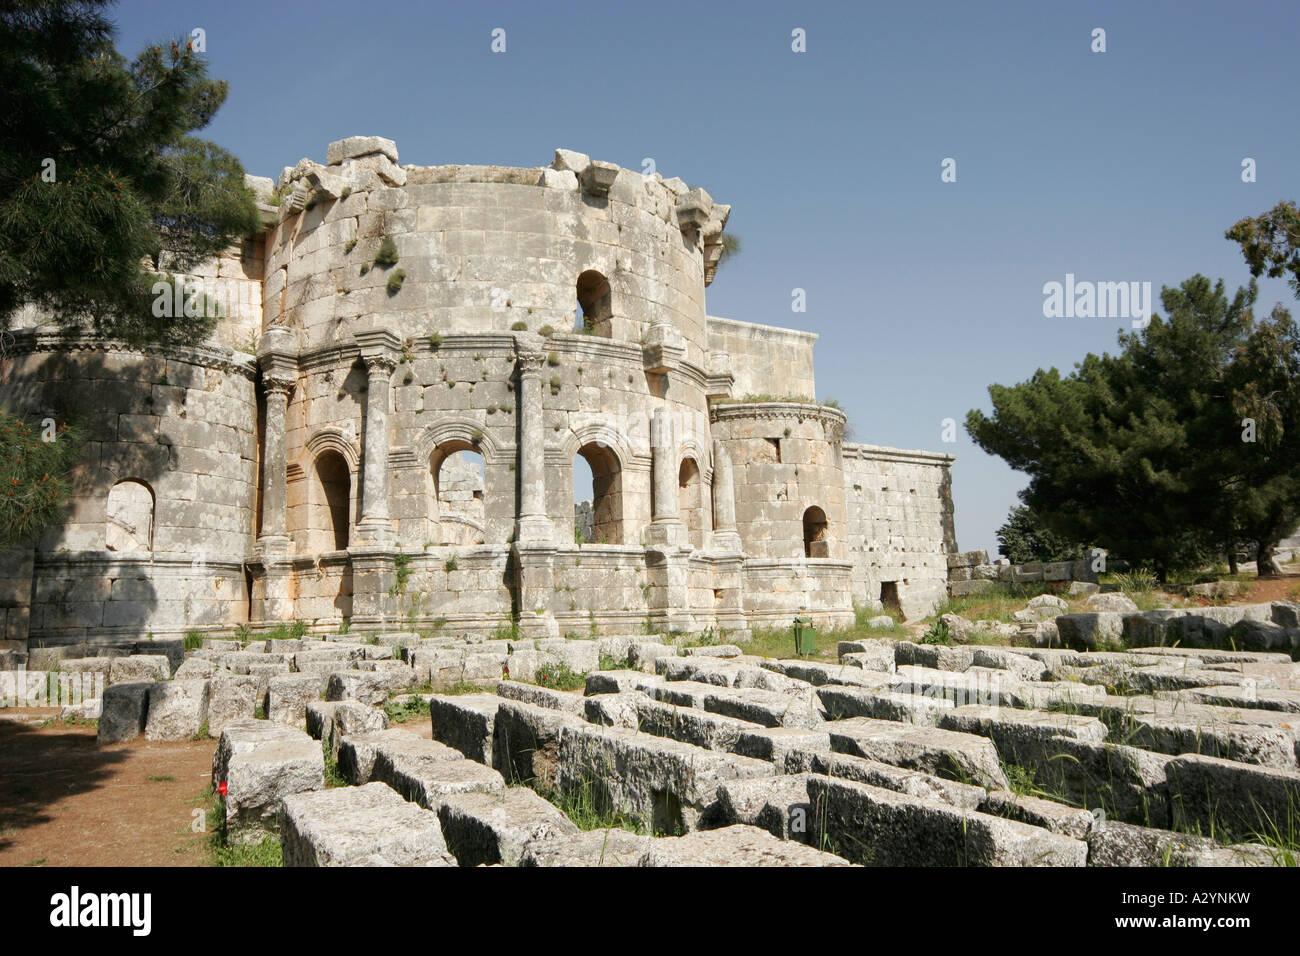 Basilica of St Simeon, Qalaat Samaan, Syria, Middle East - Stock Image